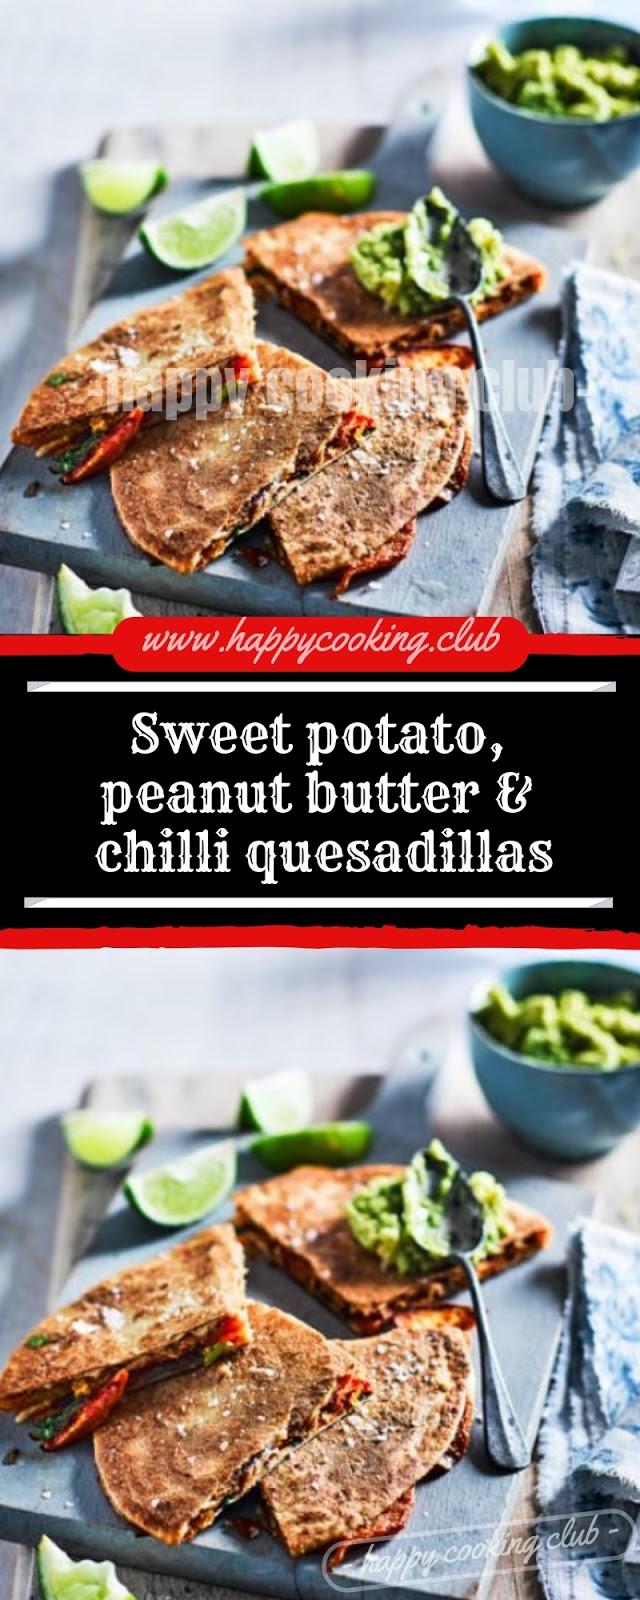 Sweet potato, peanut butter & chilli quesadillas